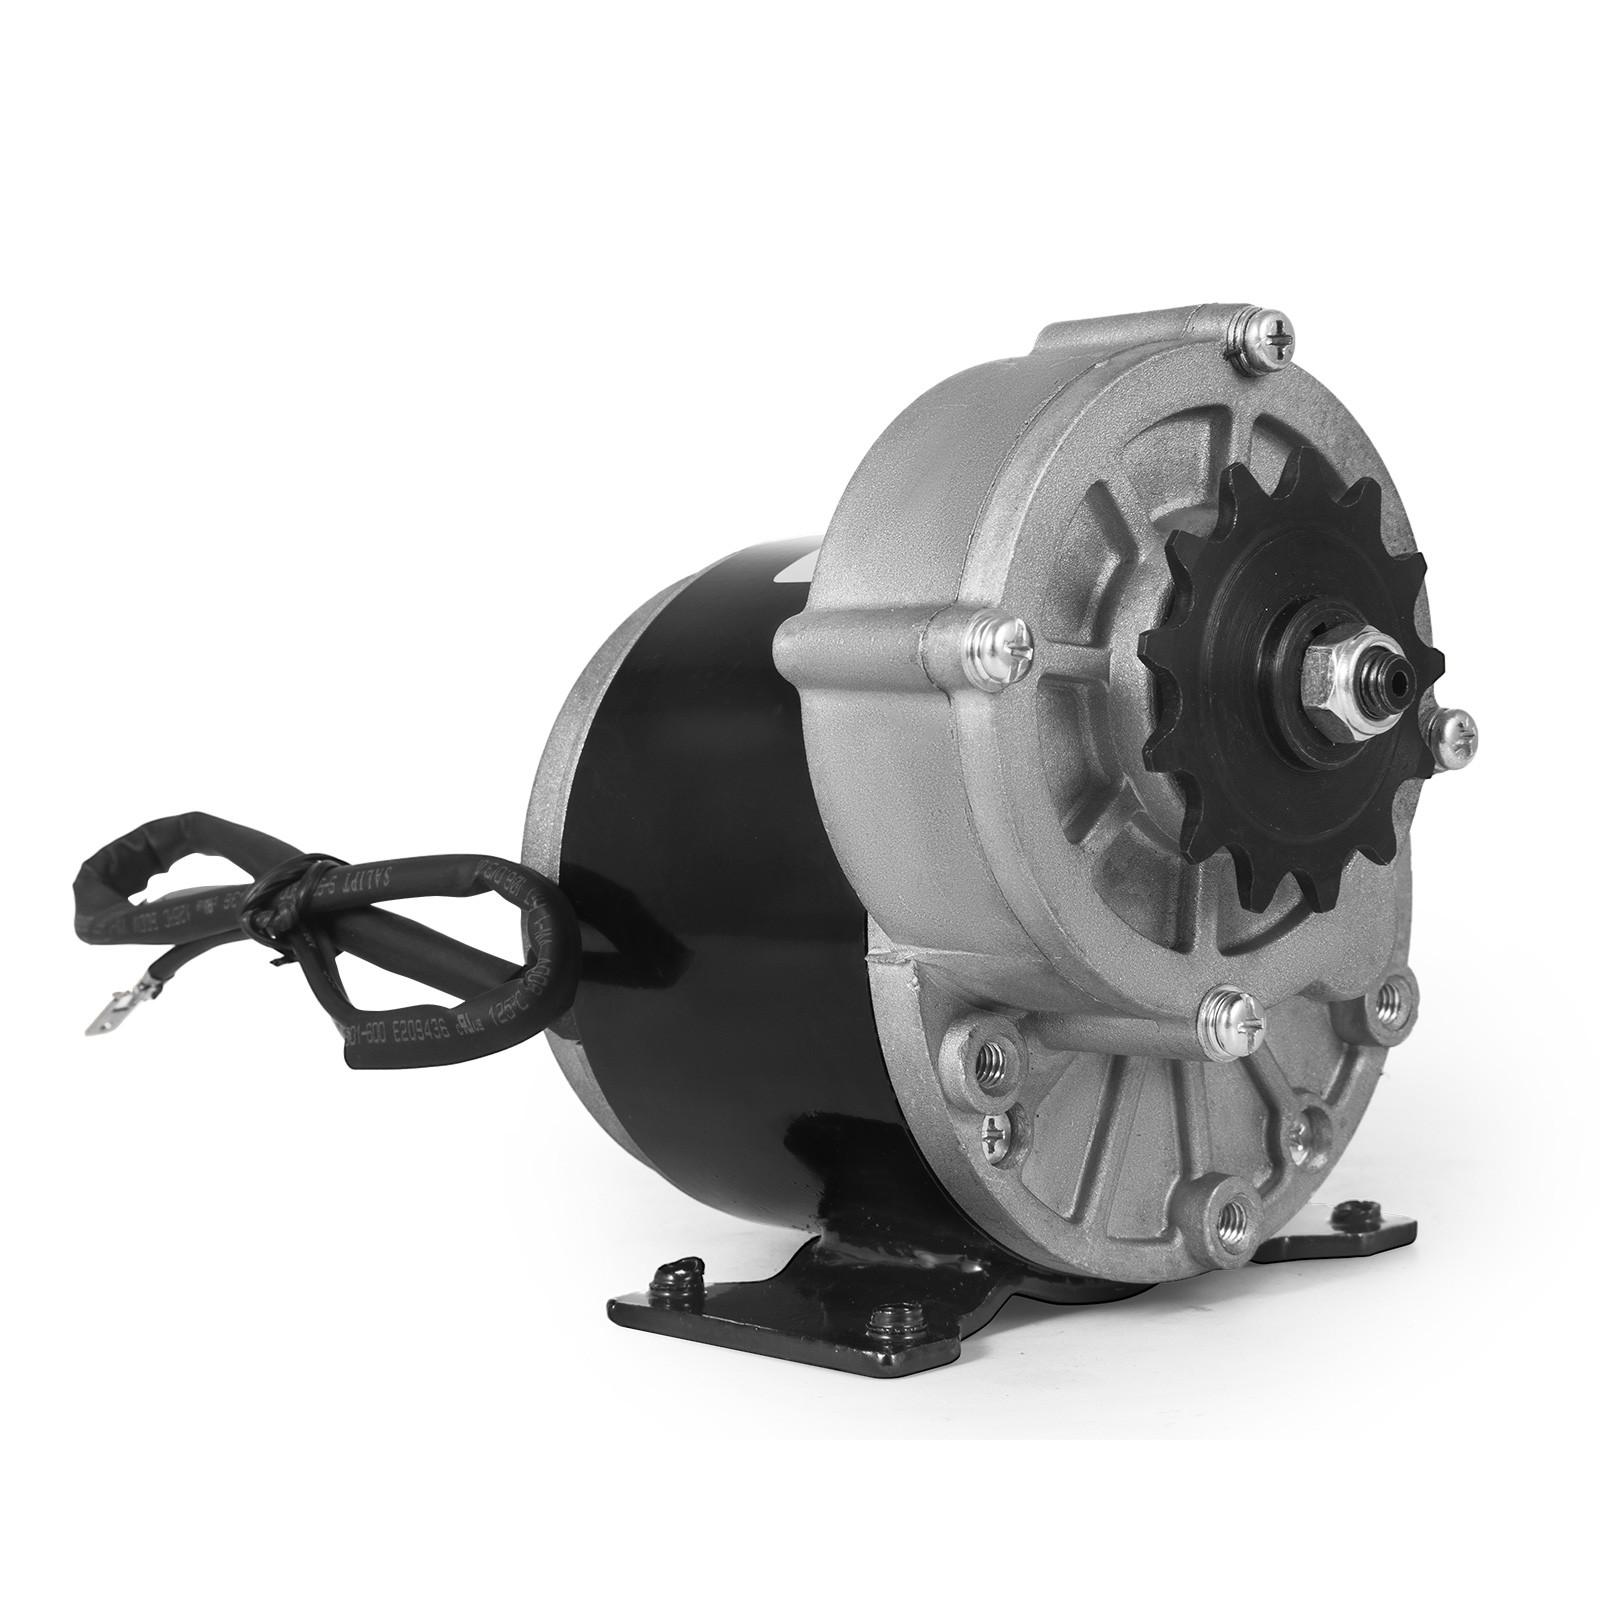 24V-500W-3500RPM-Electric-Motor-f-scooter-bike-go-kart-minibike-MY1016 thumbnail 51